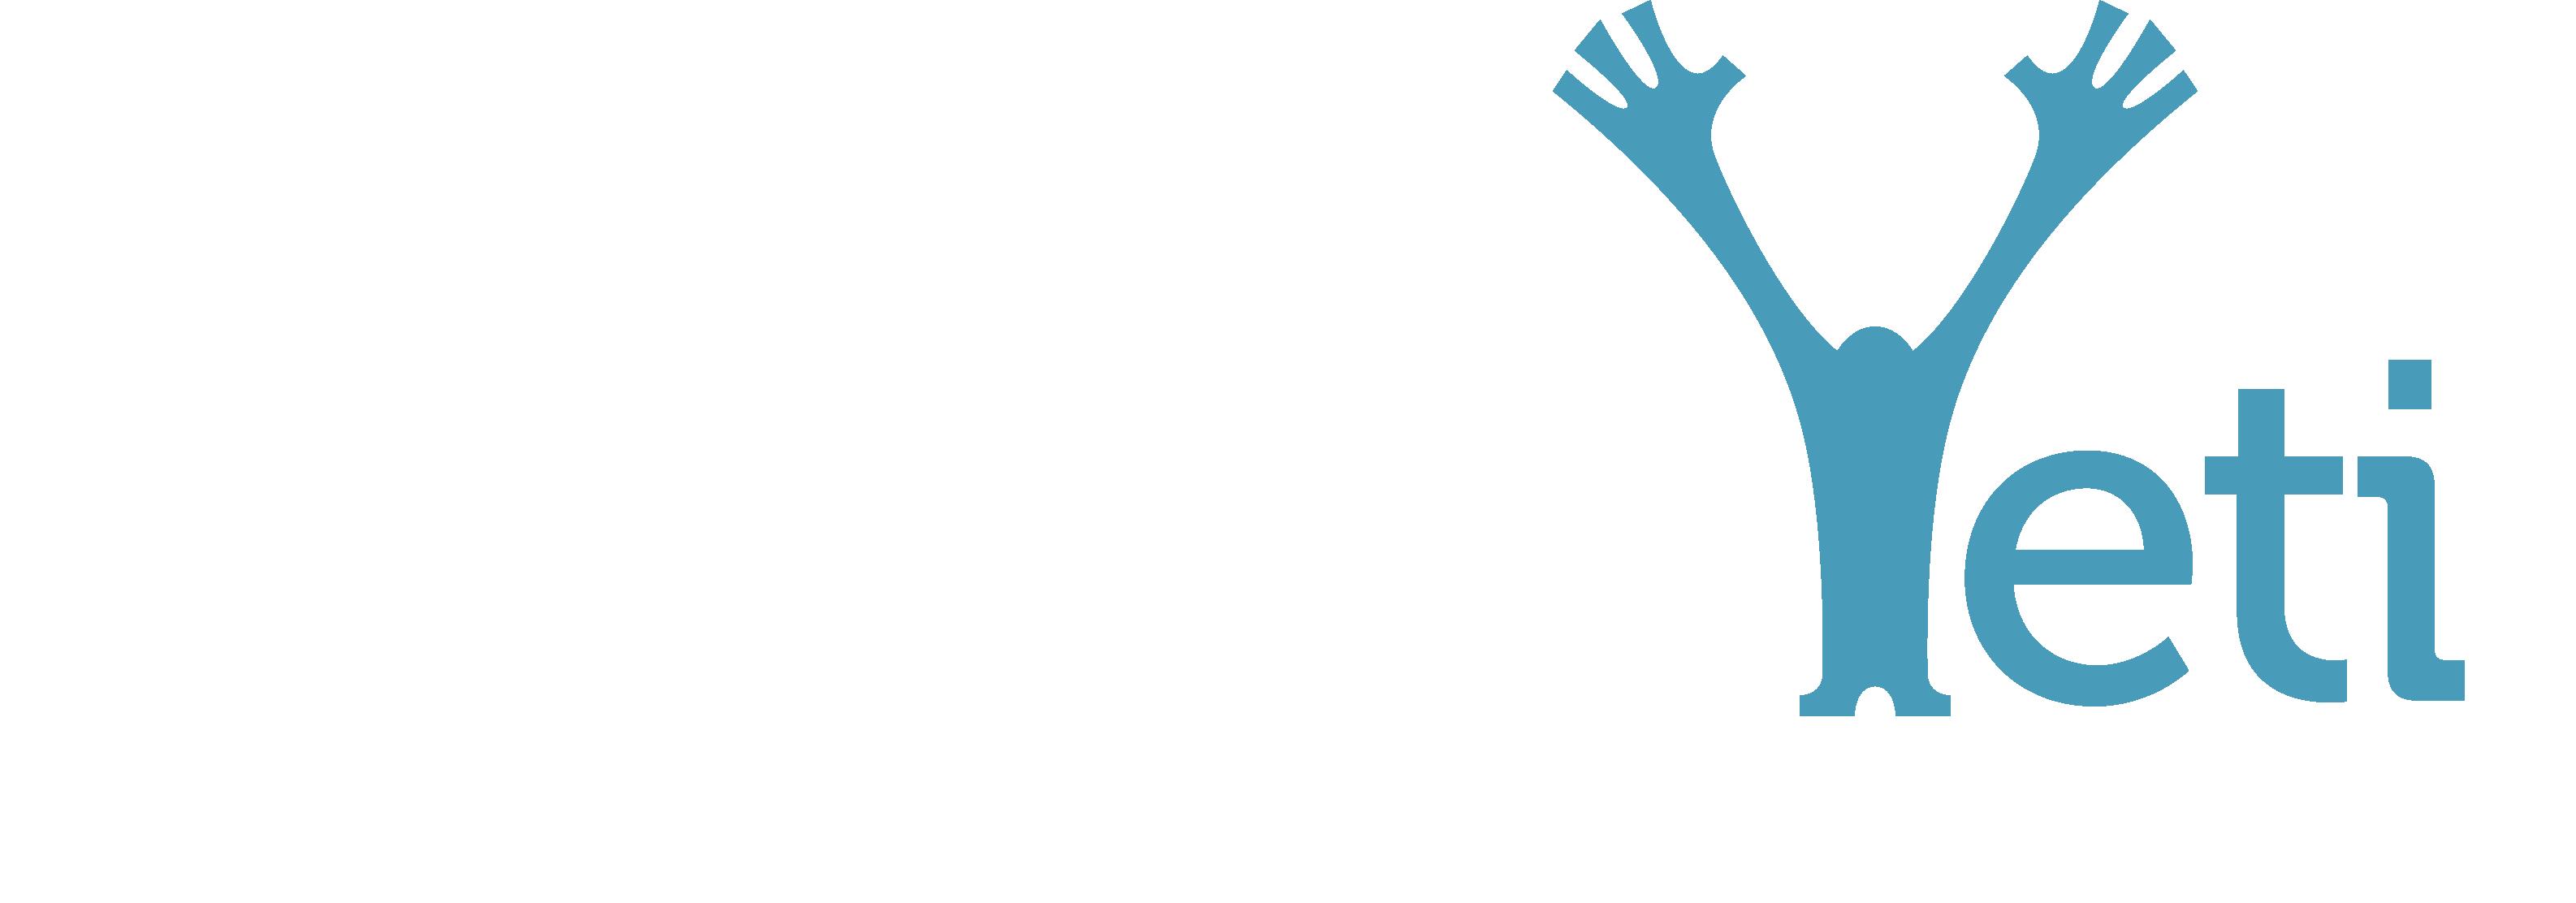 Spotted Yeti Media Video Production Cincinnati Logo on Black